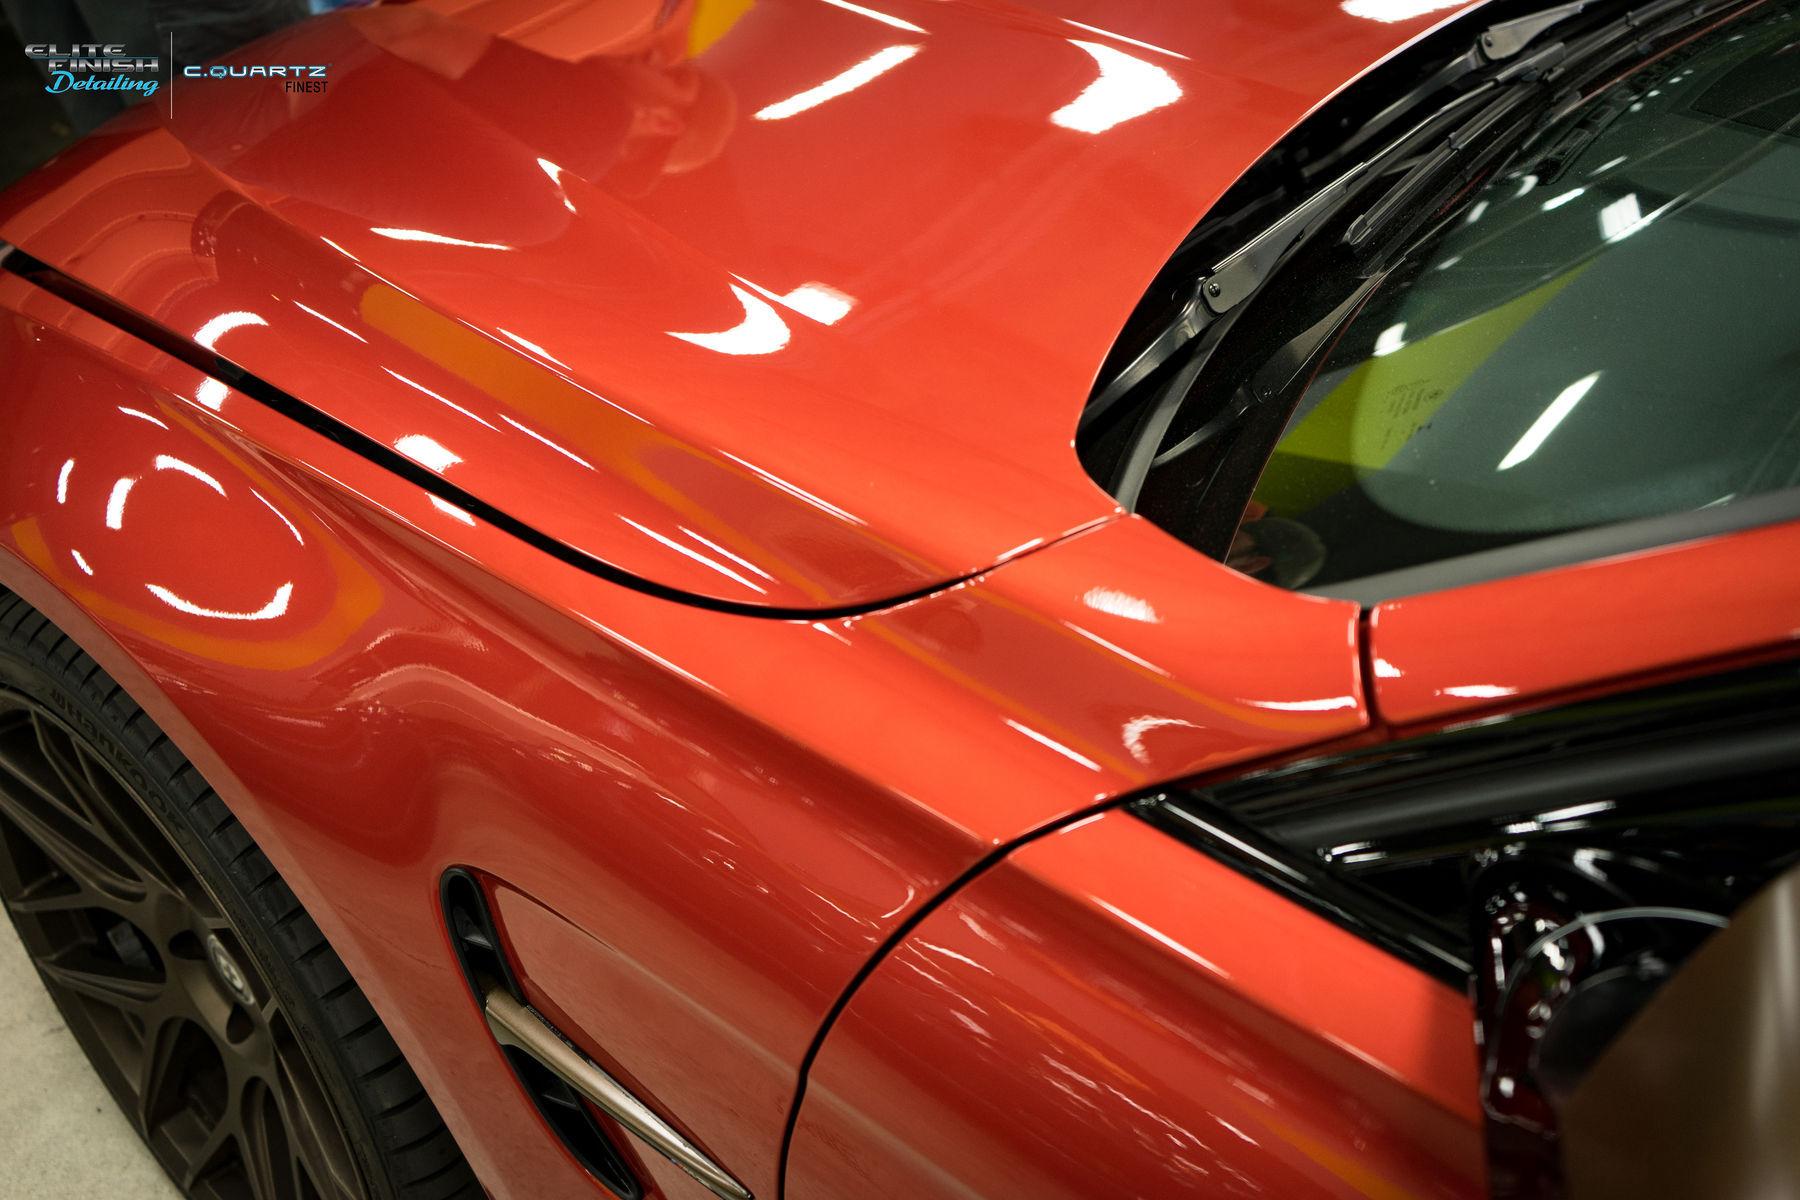 2014 BMW M3   How to use CarPro Reload Spray Sealant